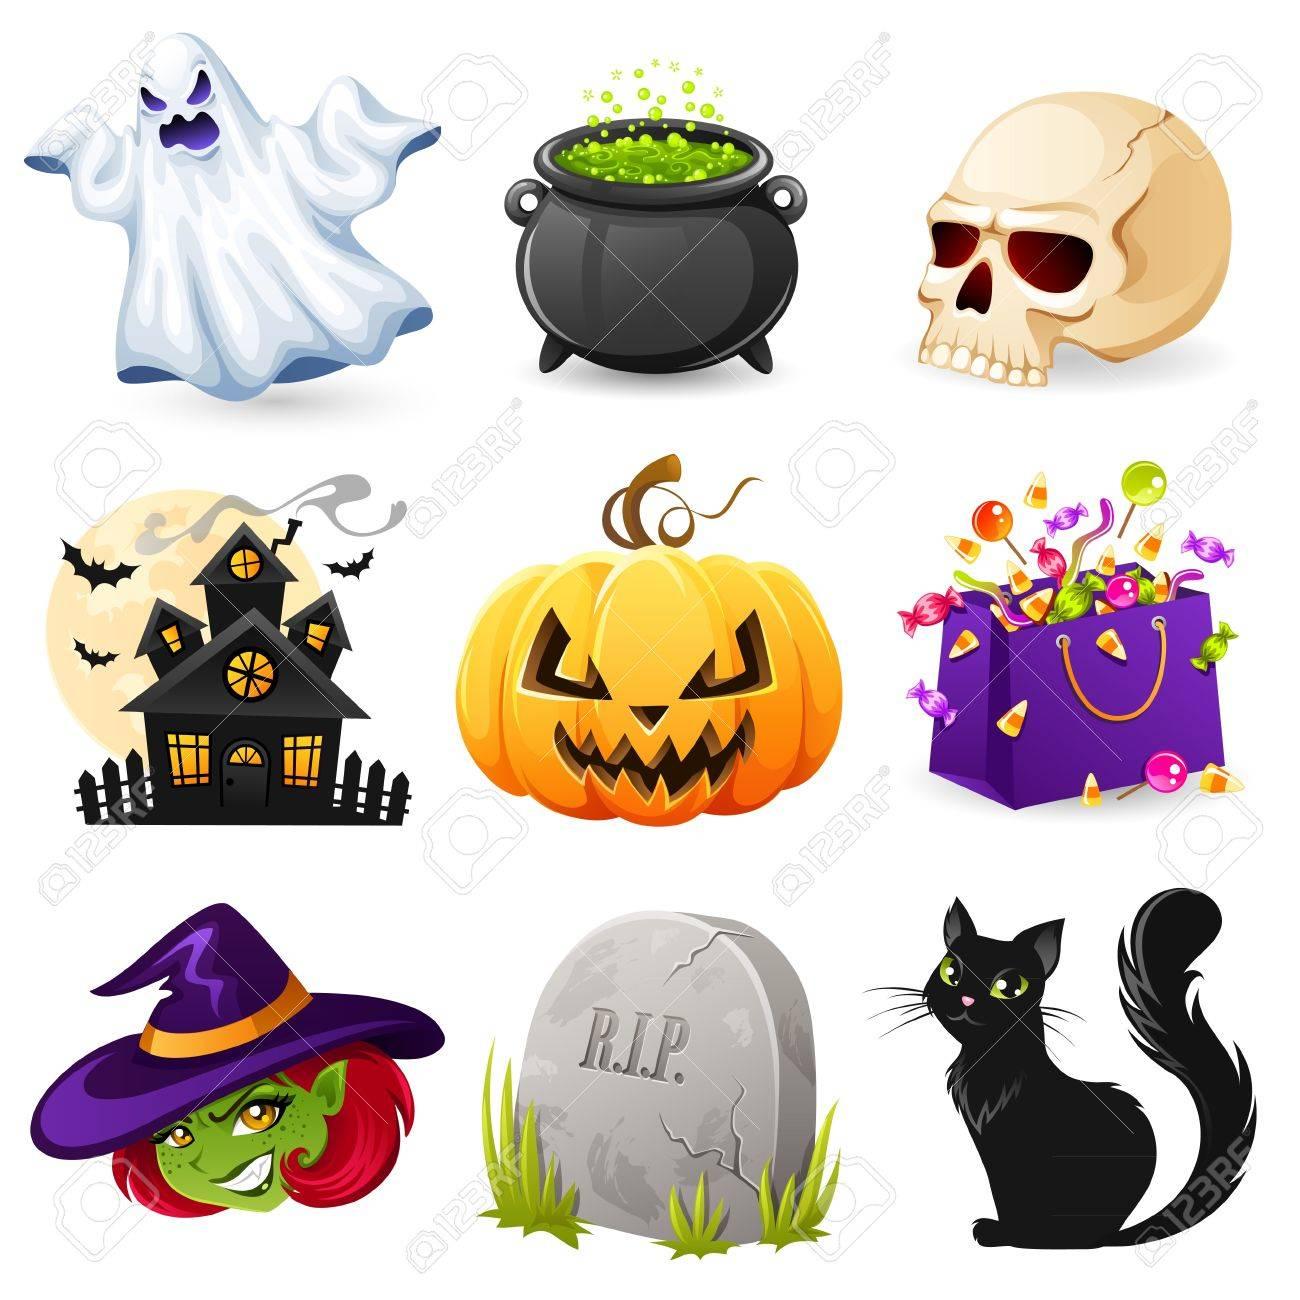 Halloween icon set Stock Vector - 10683888